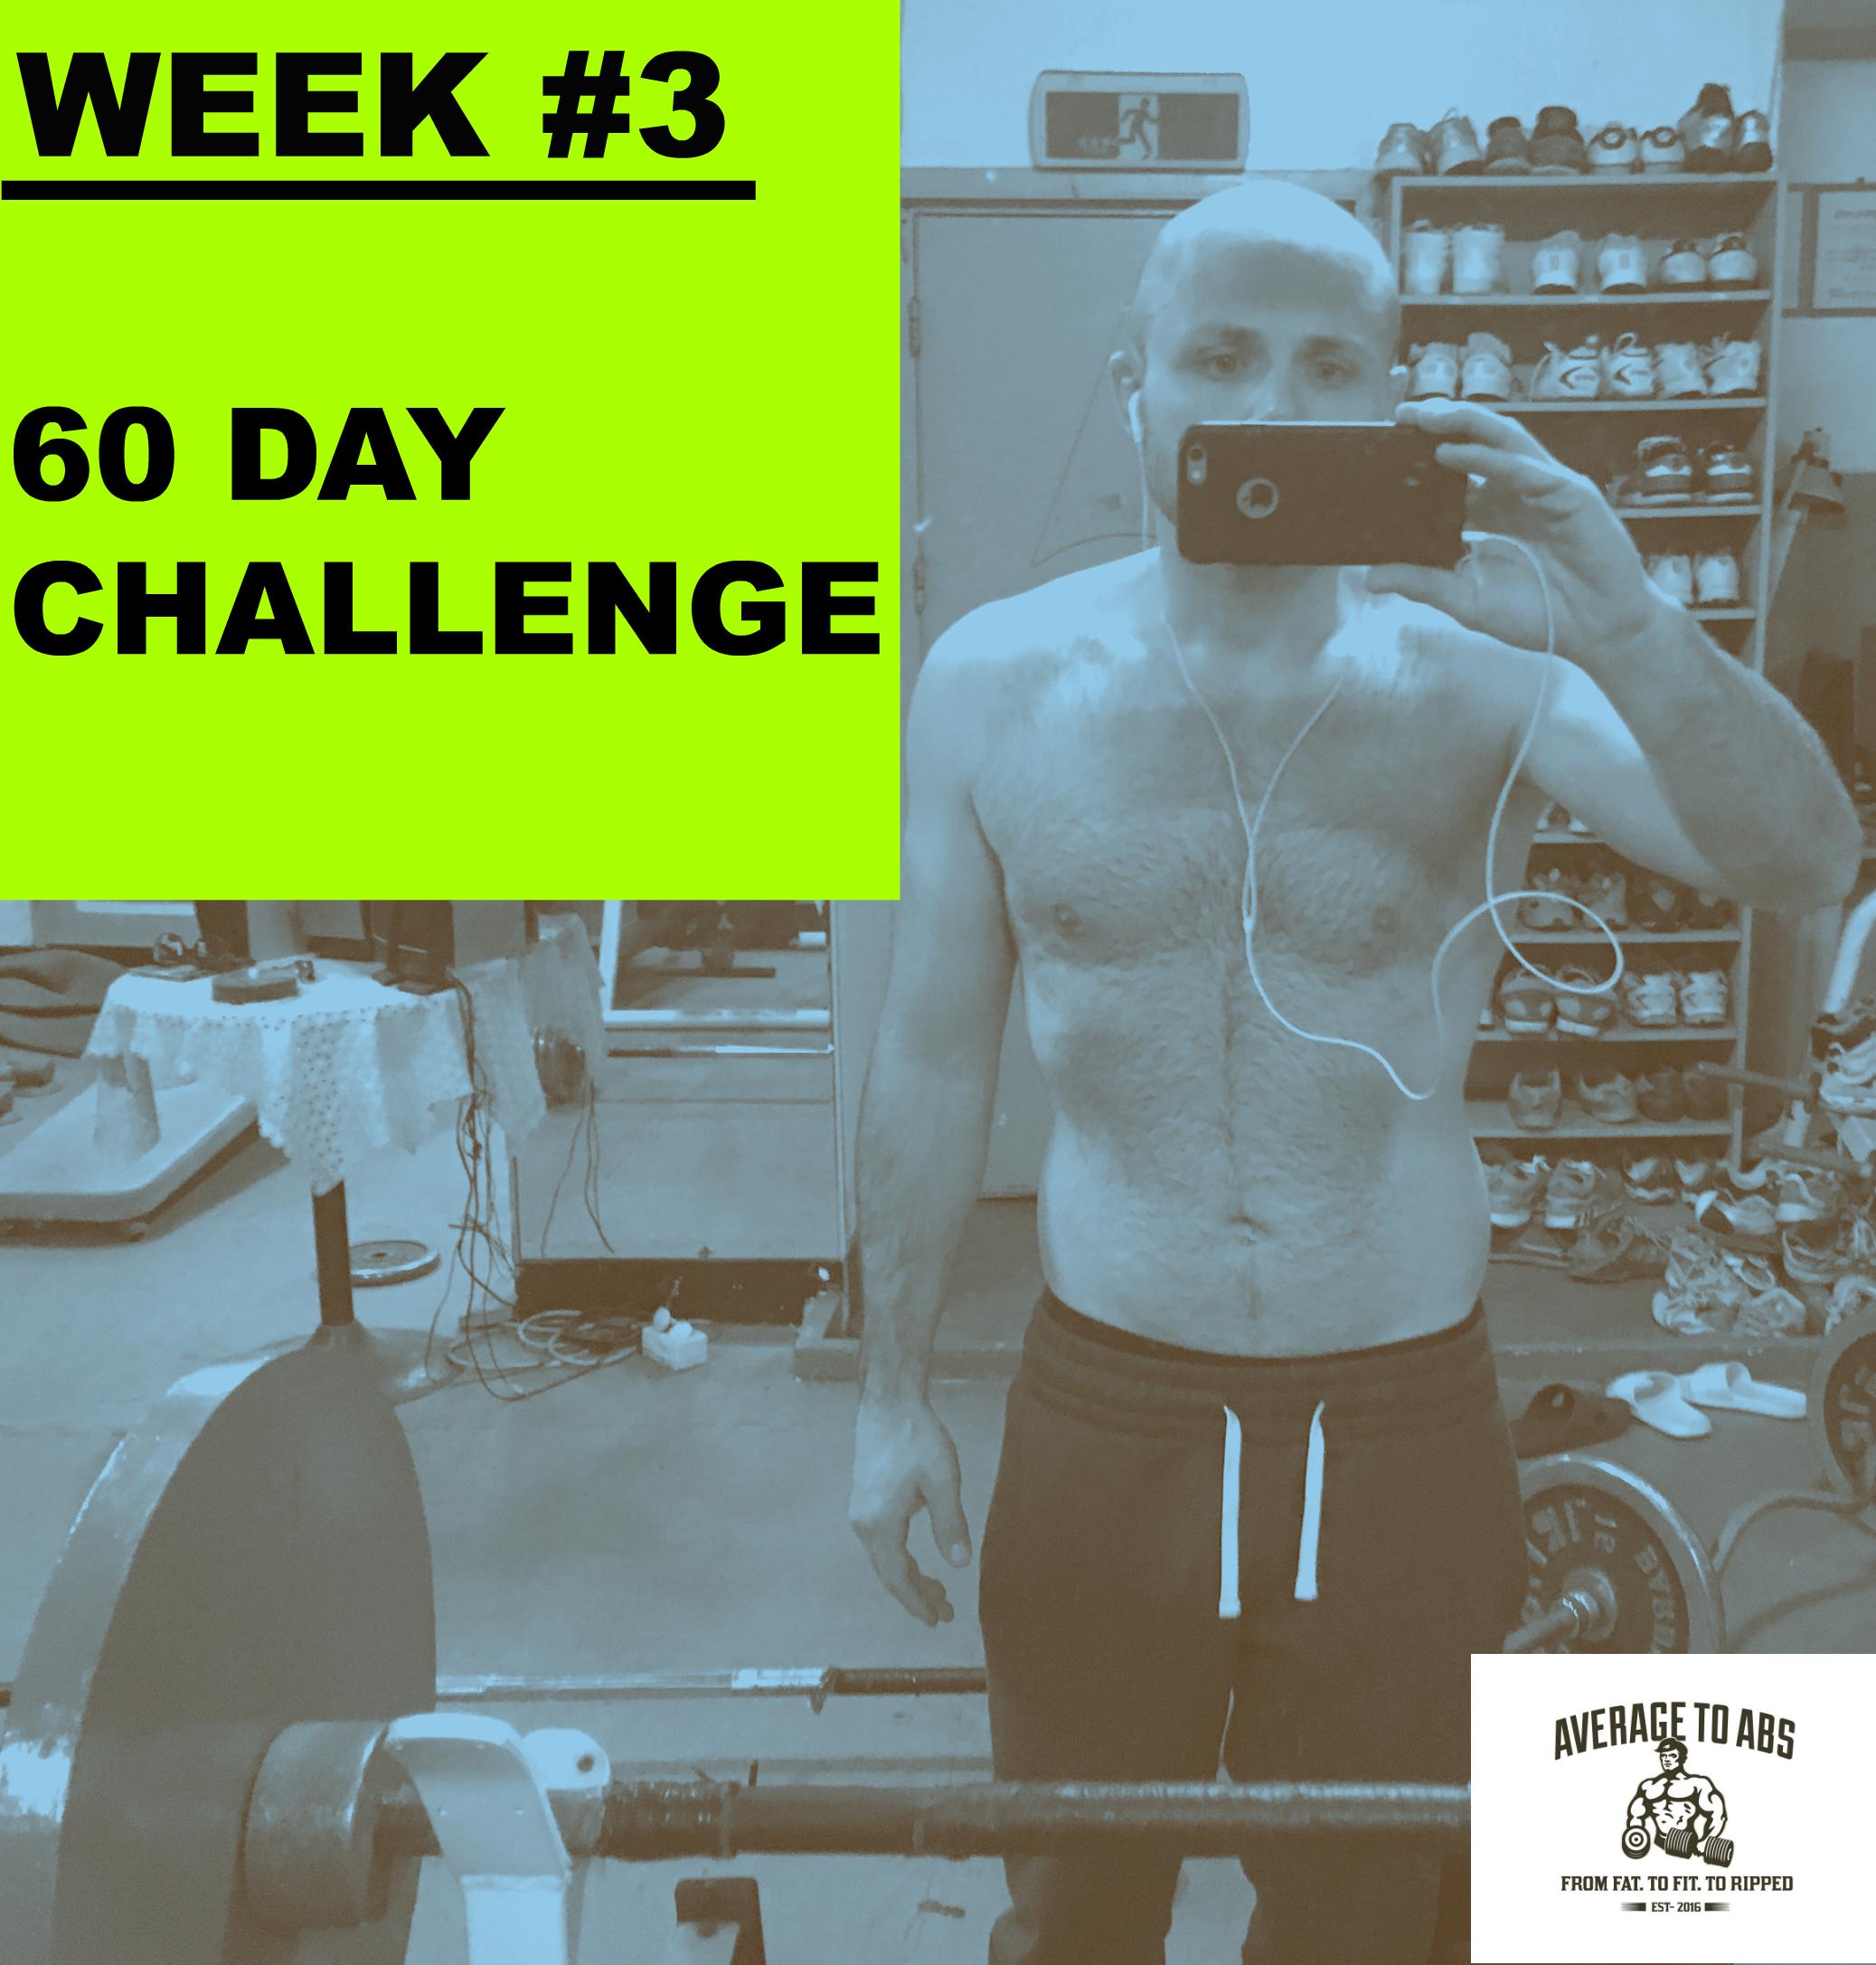 60 Day Challenge Week 3